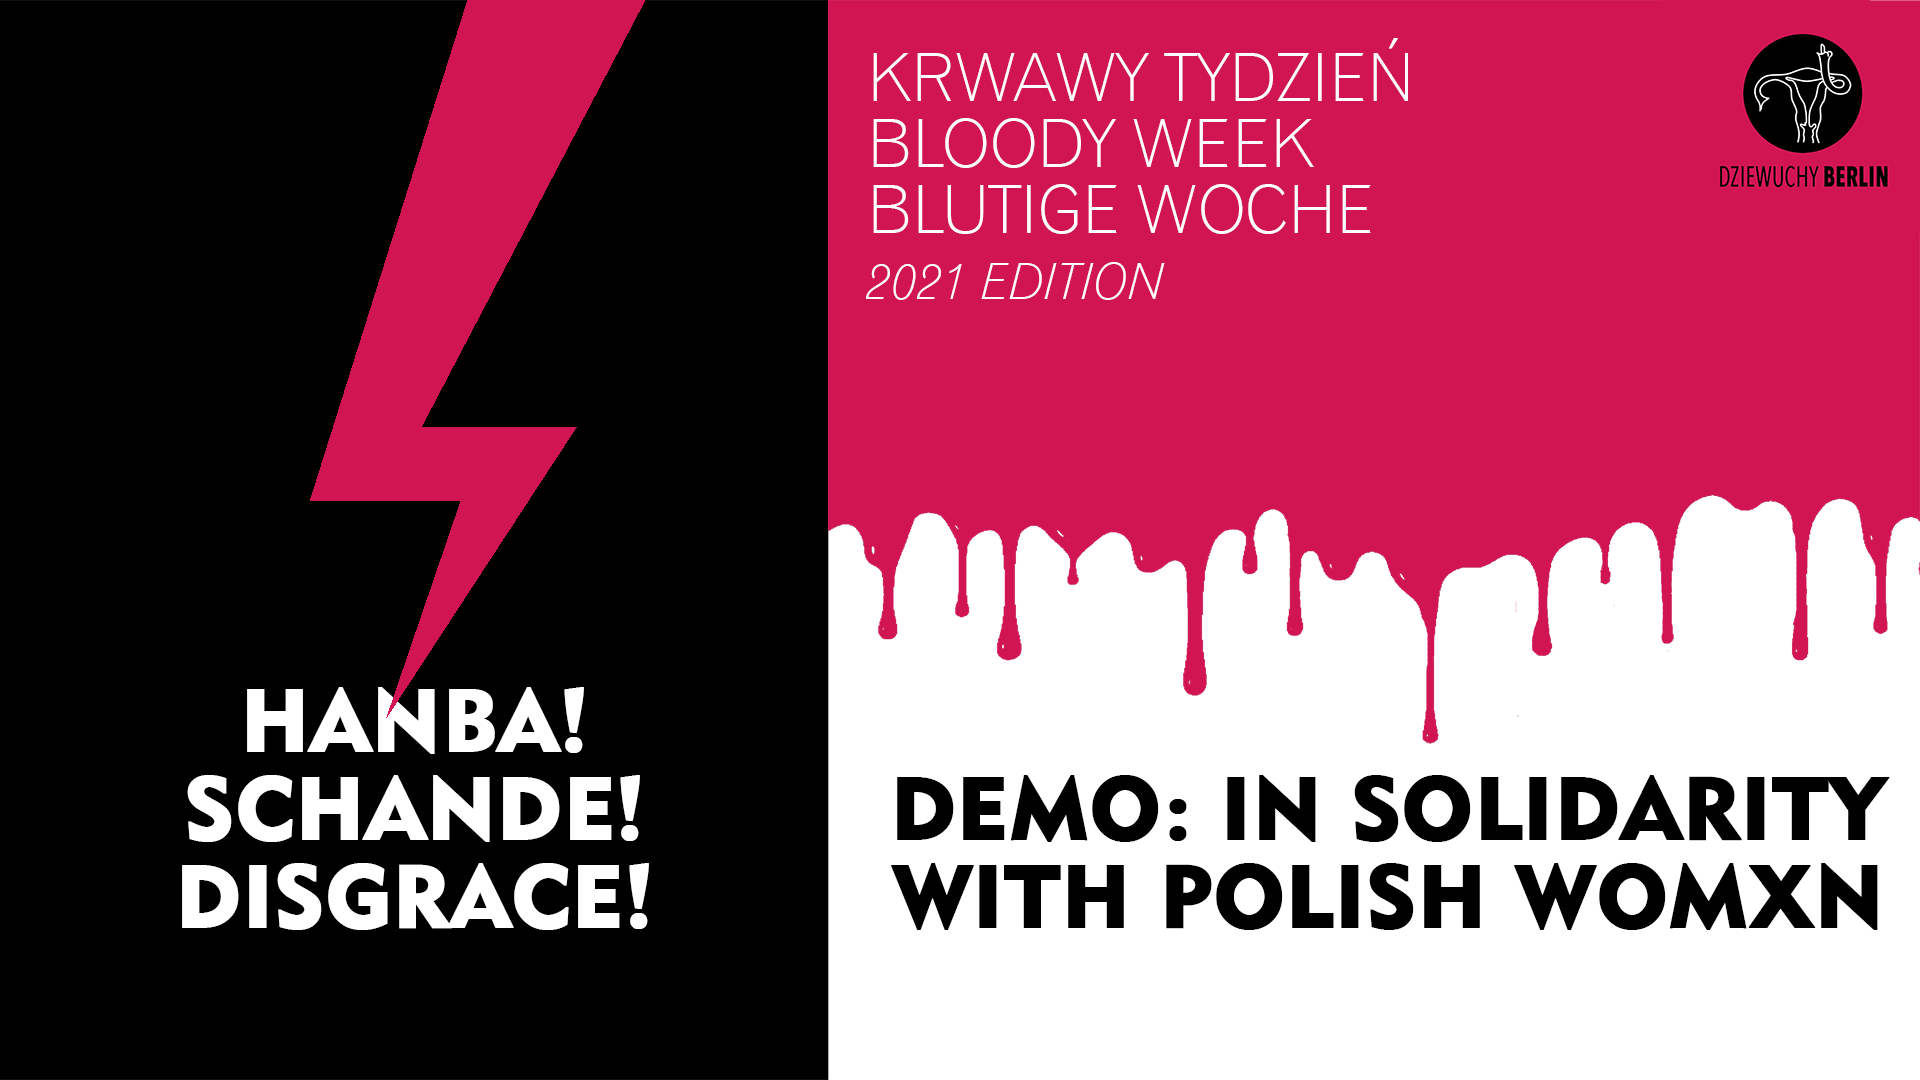 31.1.2021 Hańba! Schande! Disgrace! Soli demo with Polish women